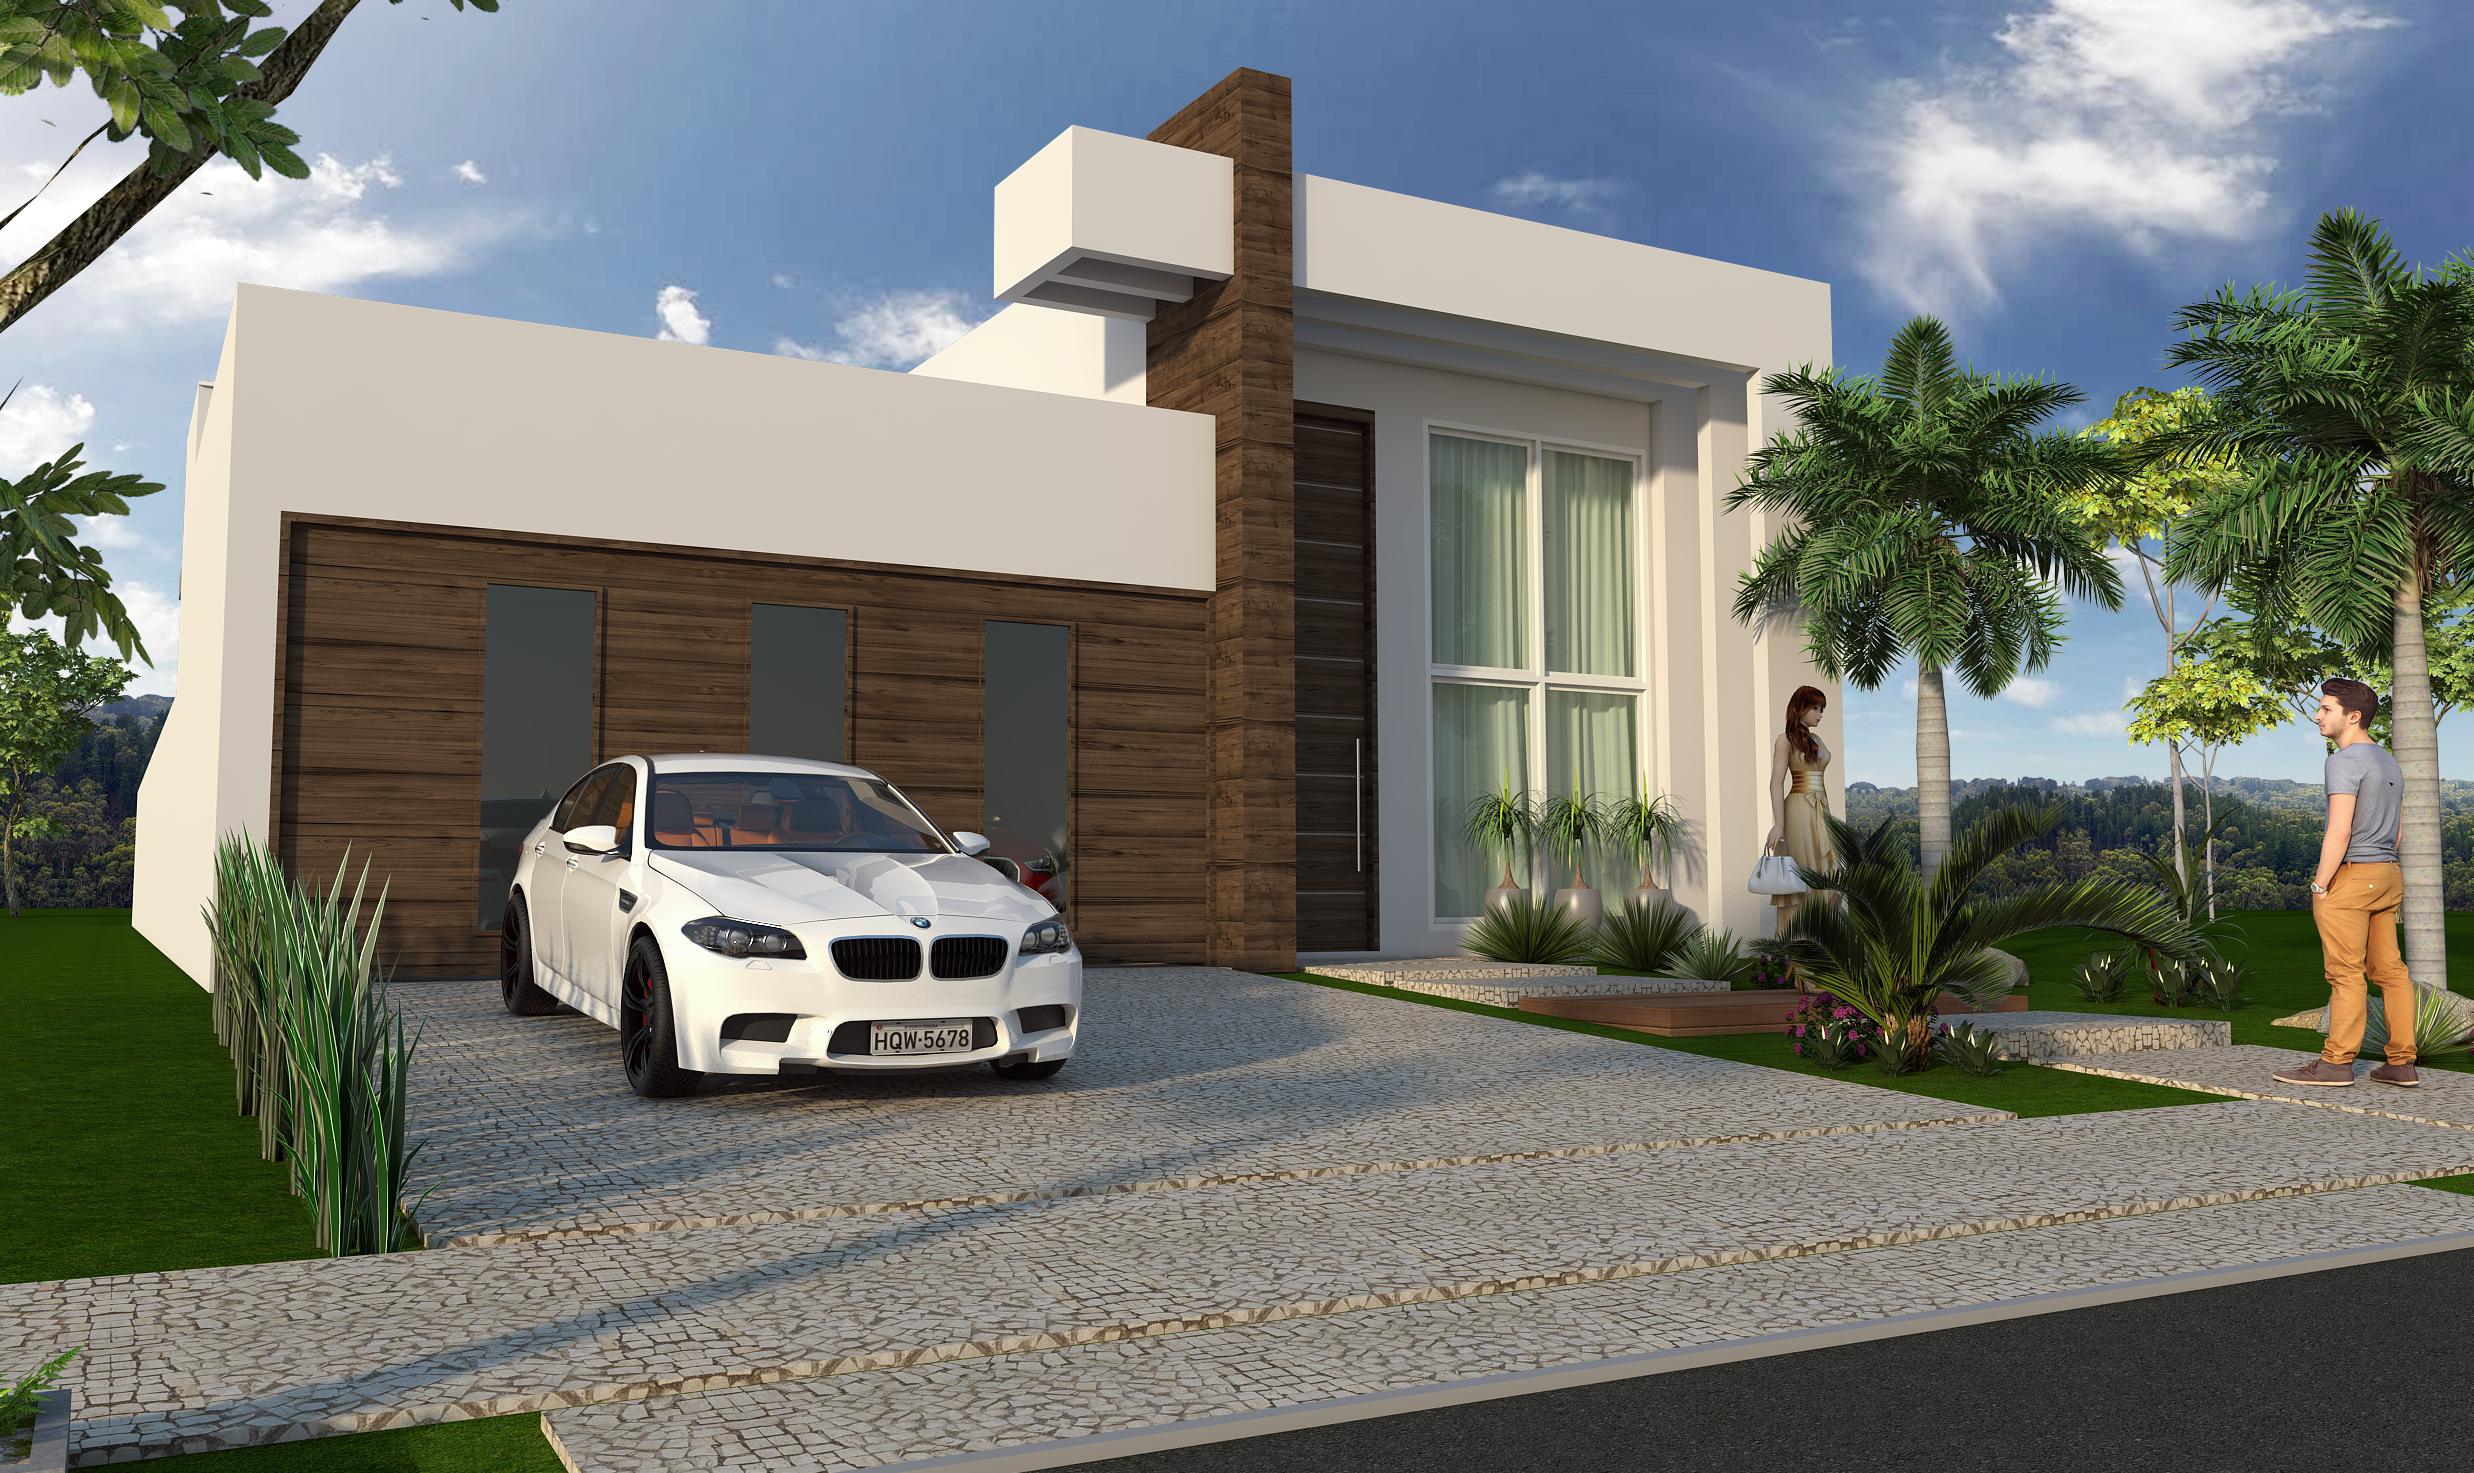 Arquitetura moderna casas terreas casa avr ovar habitaes for Casa moderna